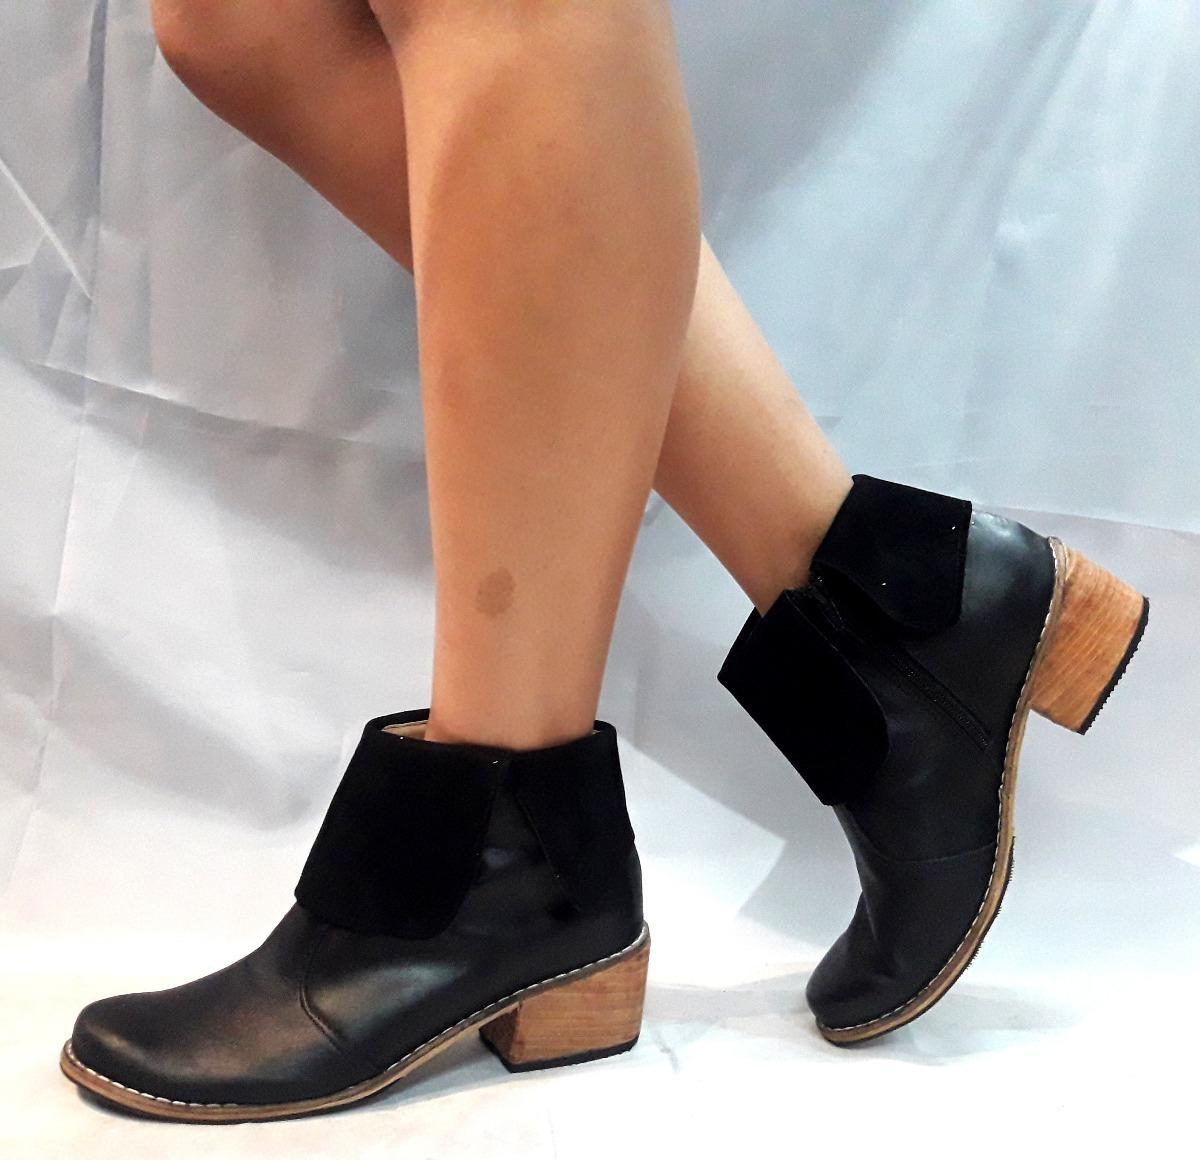 f1dc281e8bcbf sam123 botas bajas mujer talle grande jal negra oferta. Cargando zoom.